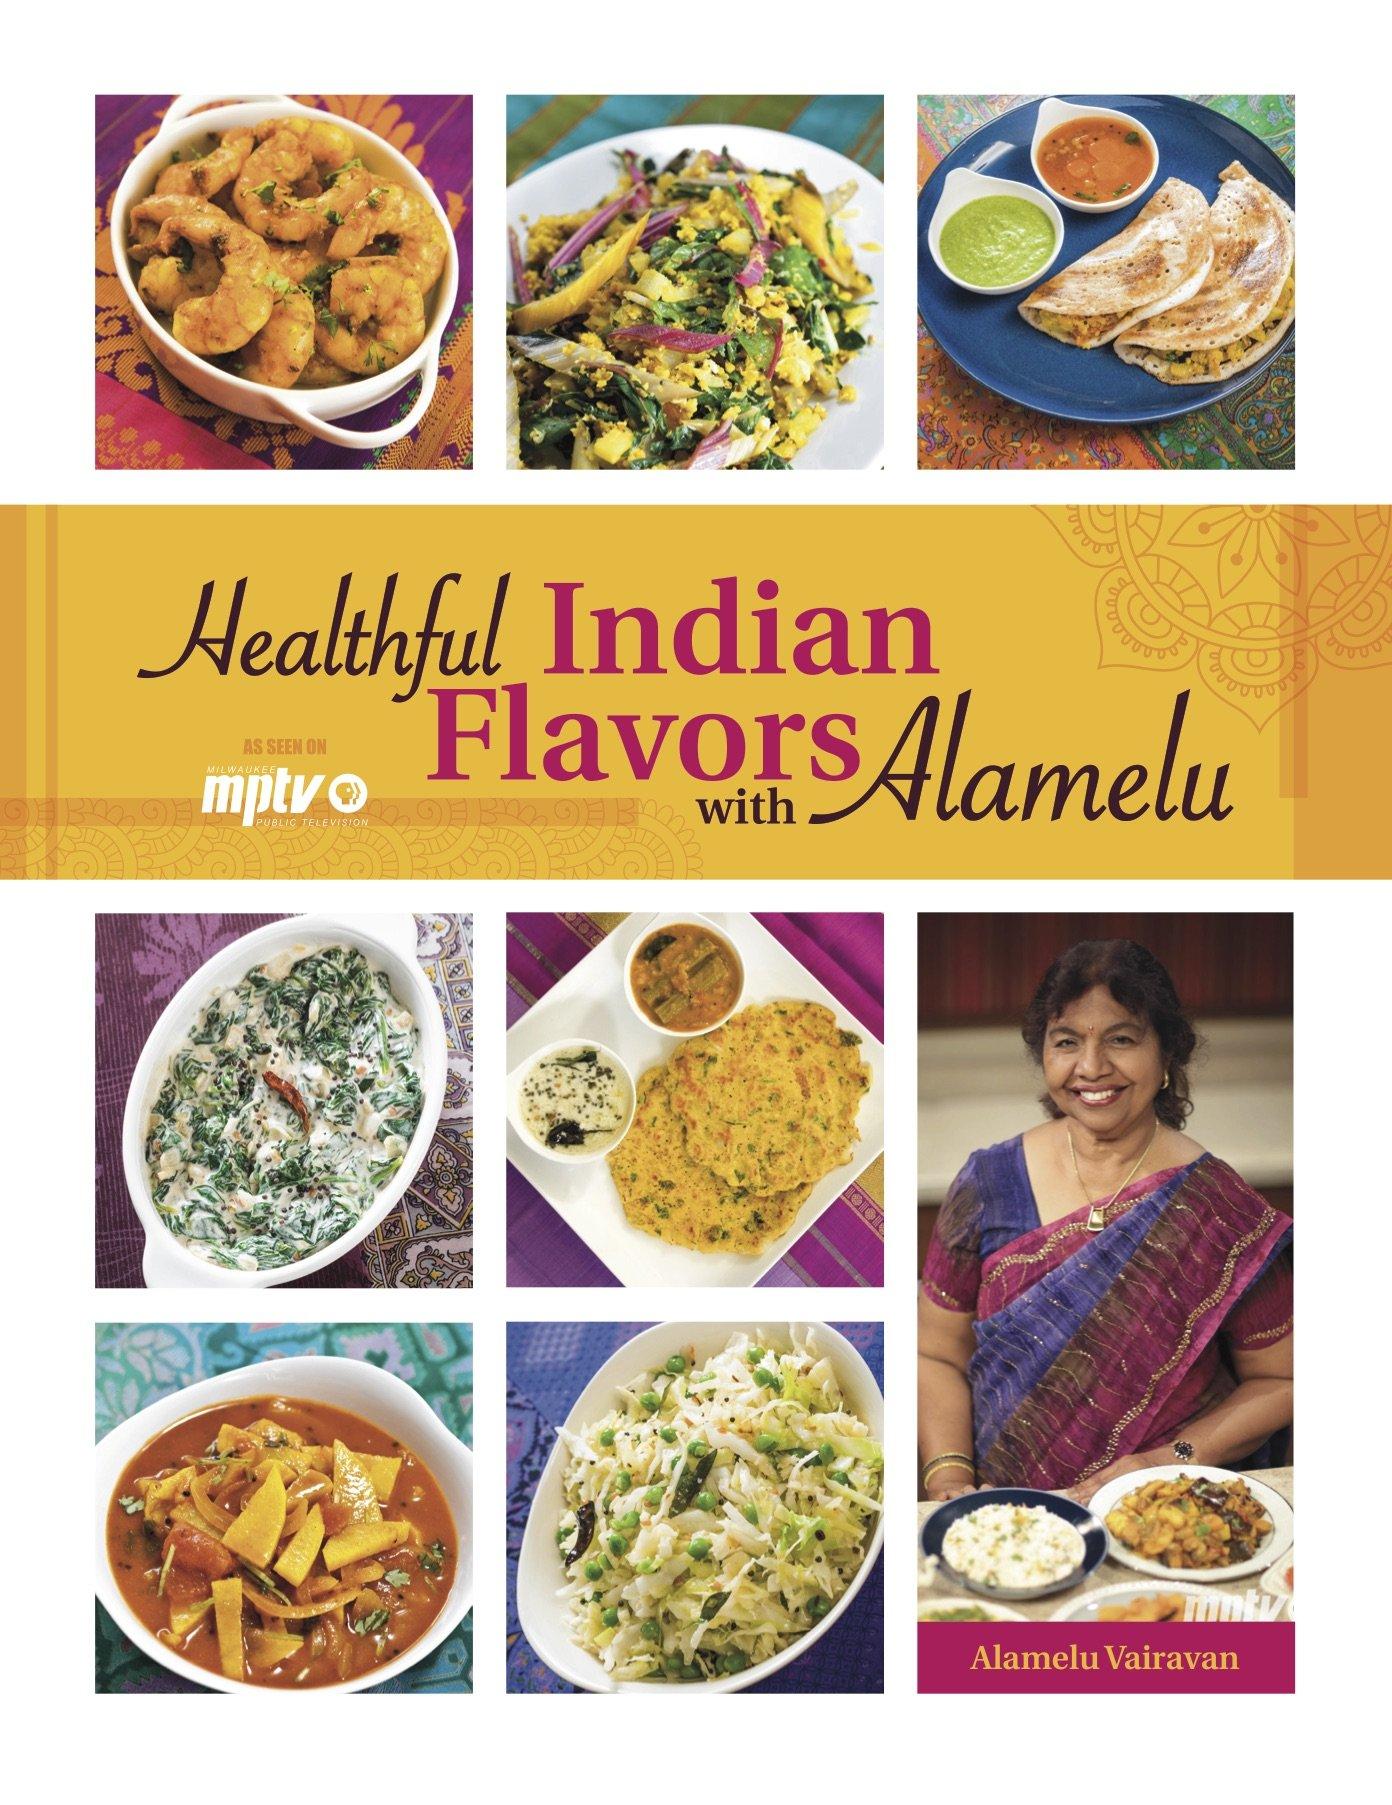 Healthful Indian Flavors Alamelu Vairavan product image